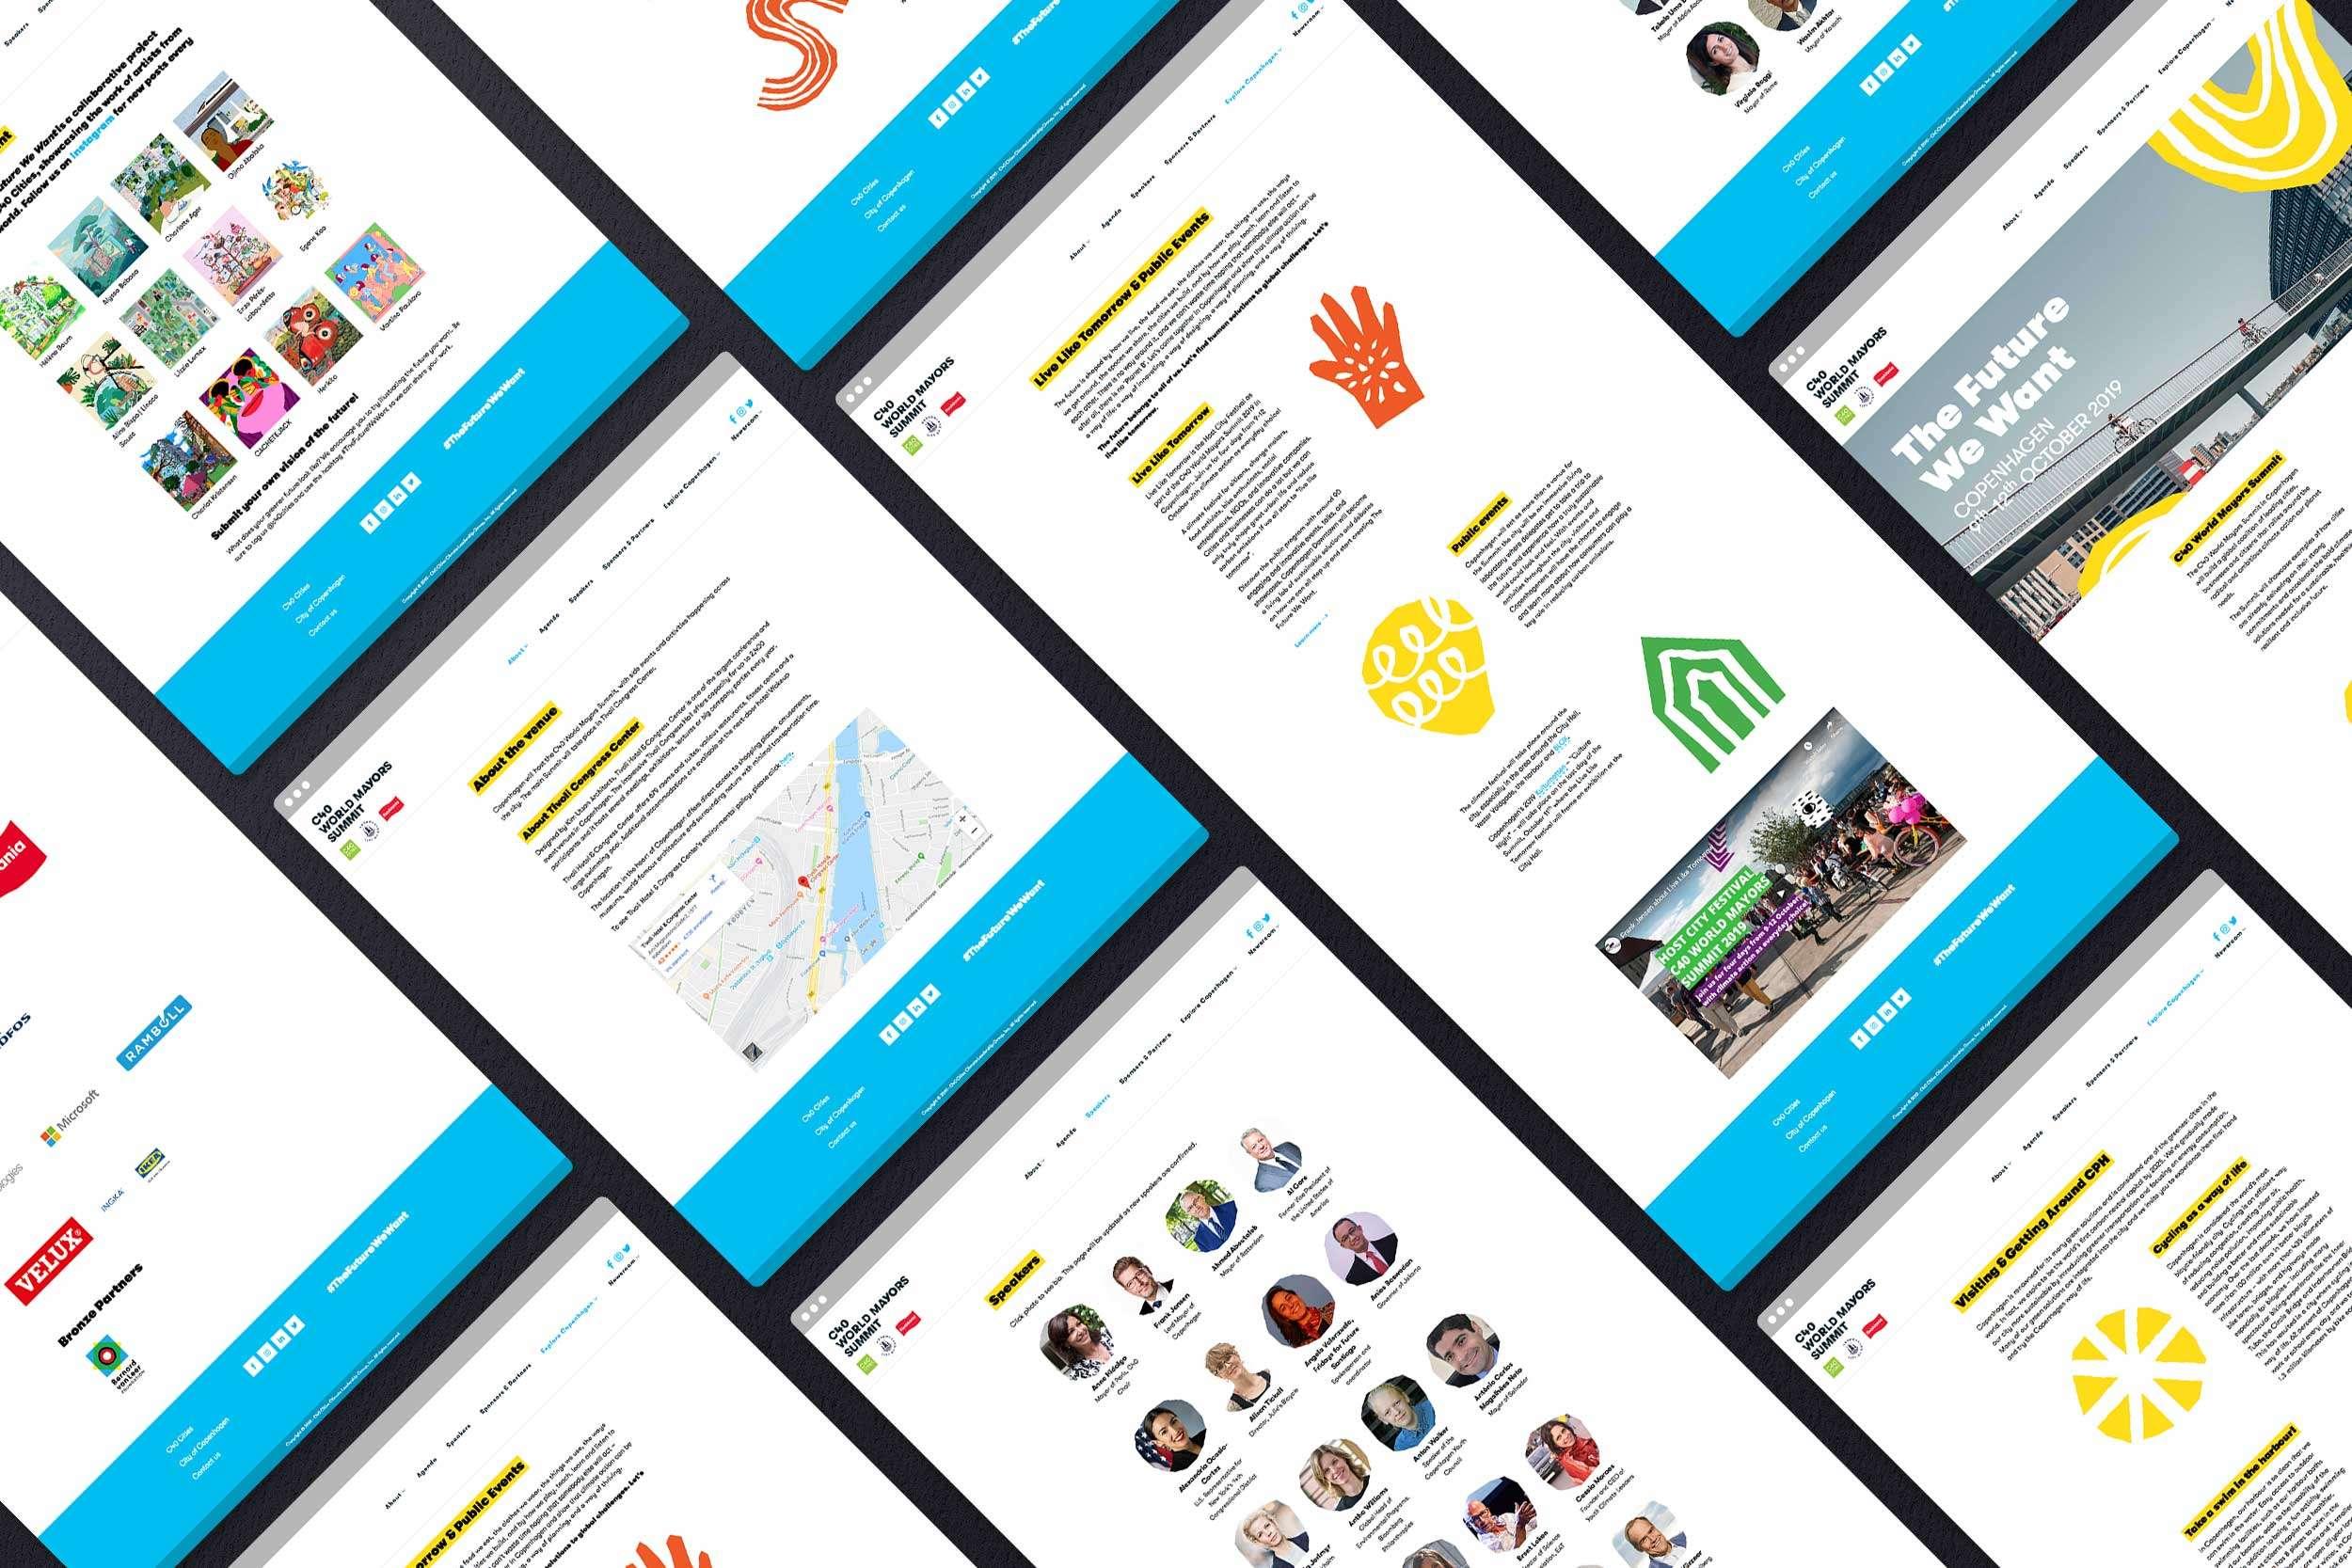 C40 World Mayors Summit, desktop